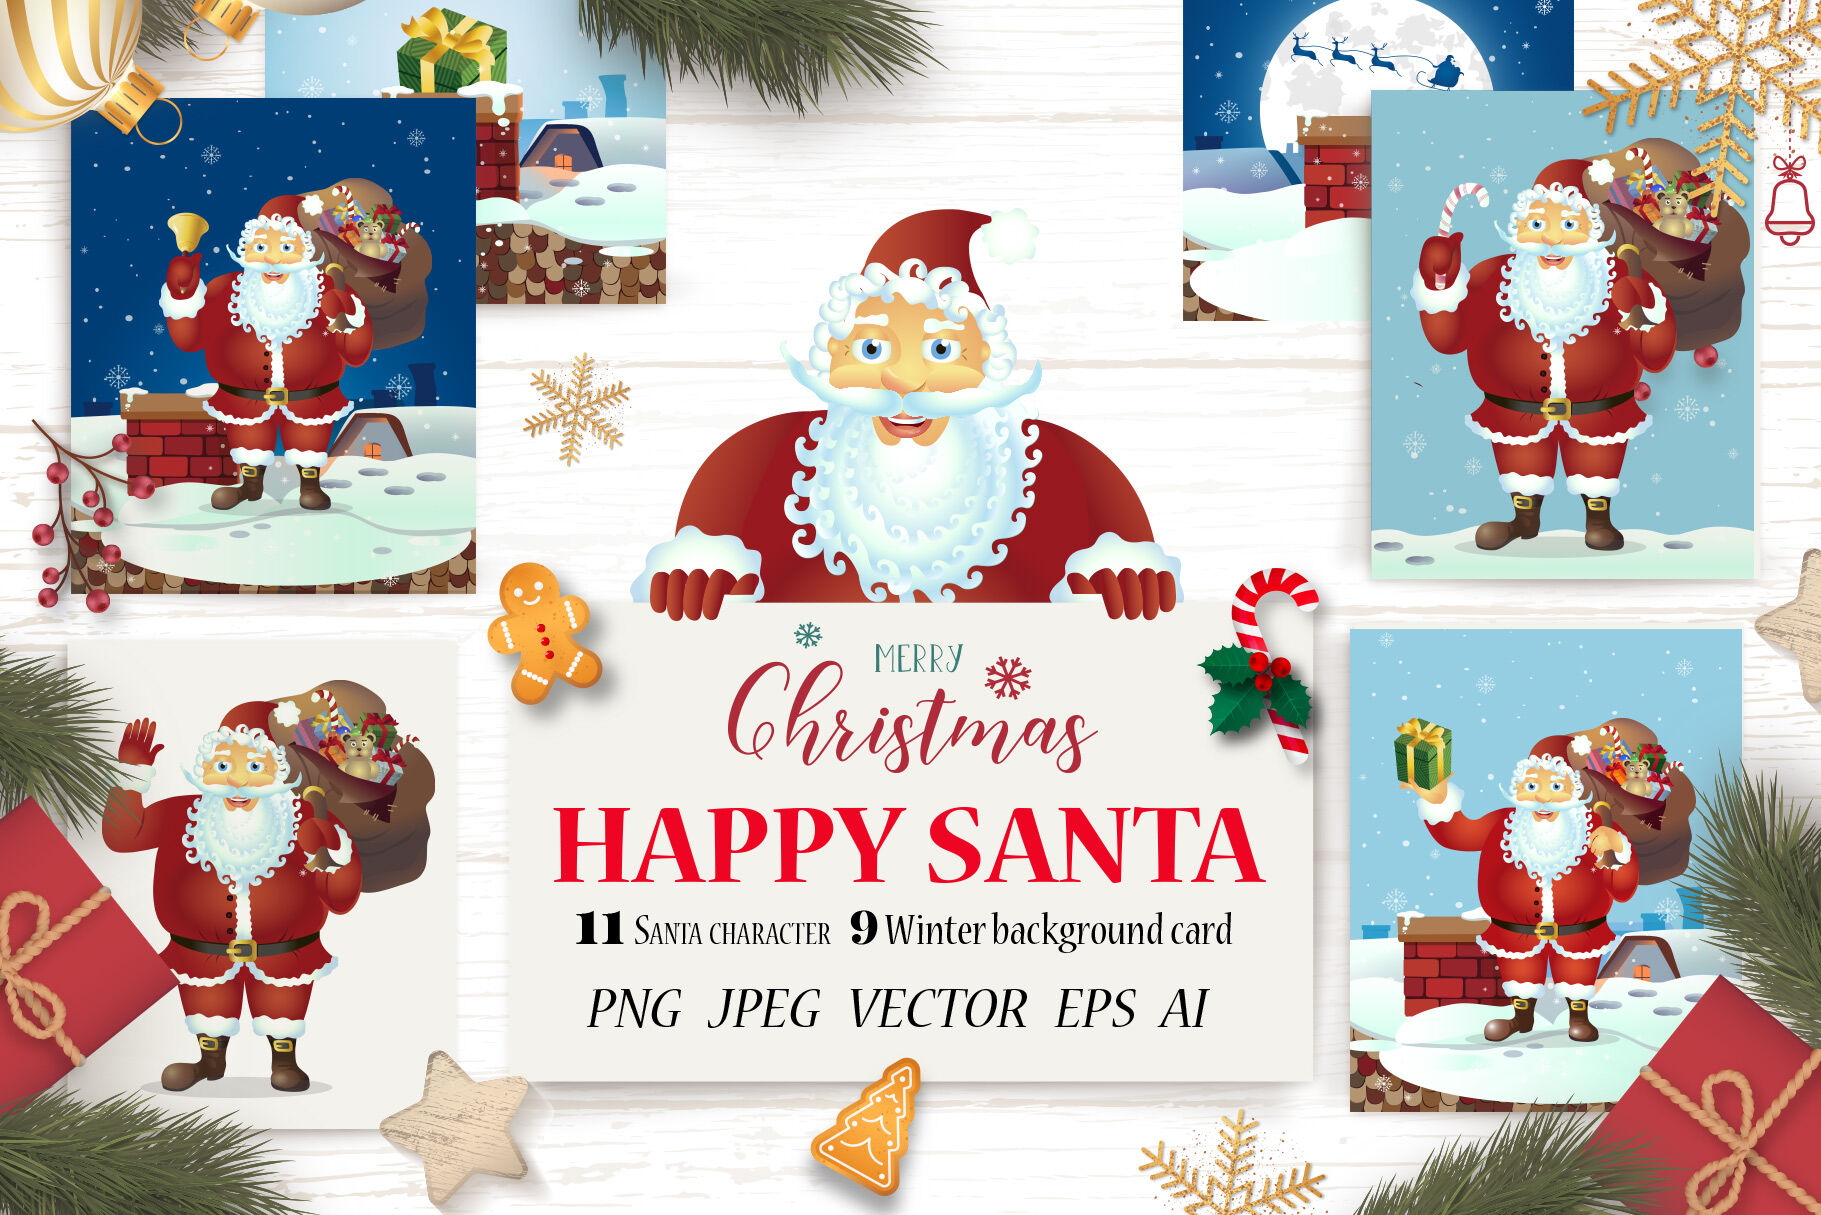 Santa Claus Merry Christmas Set By Nikodzhi Art Thehungryjpeg Com